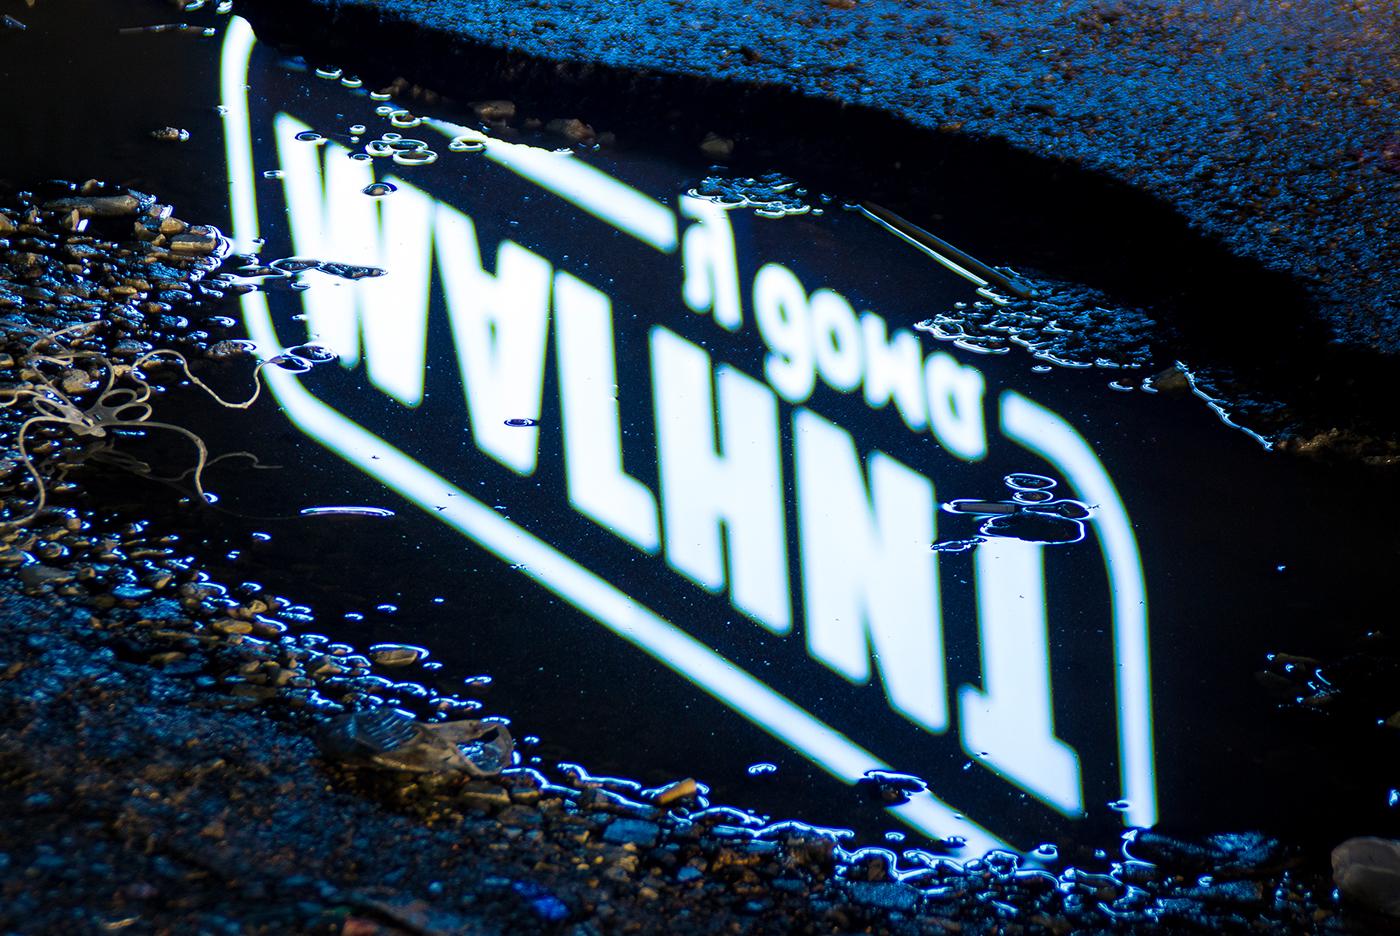 wet-neon-local-preacher-photography-12.jpg